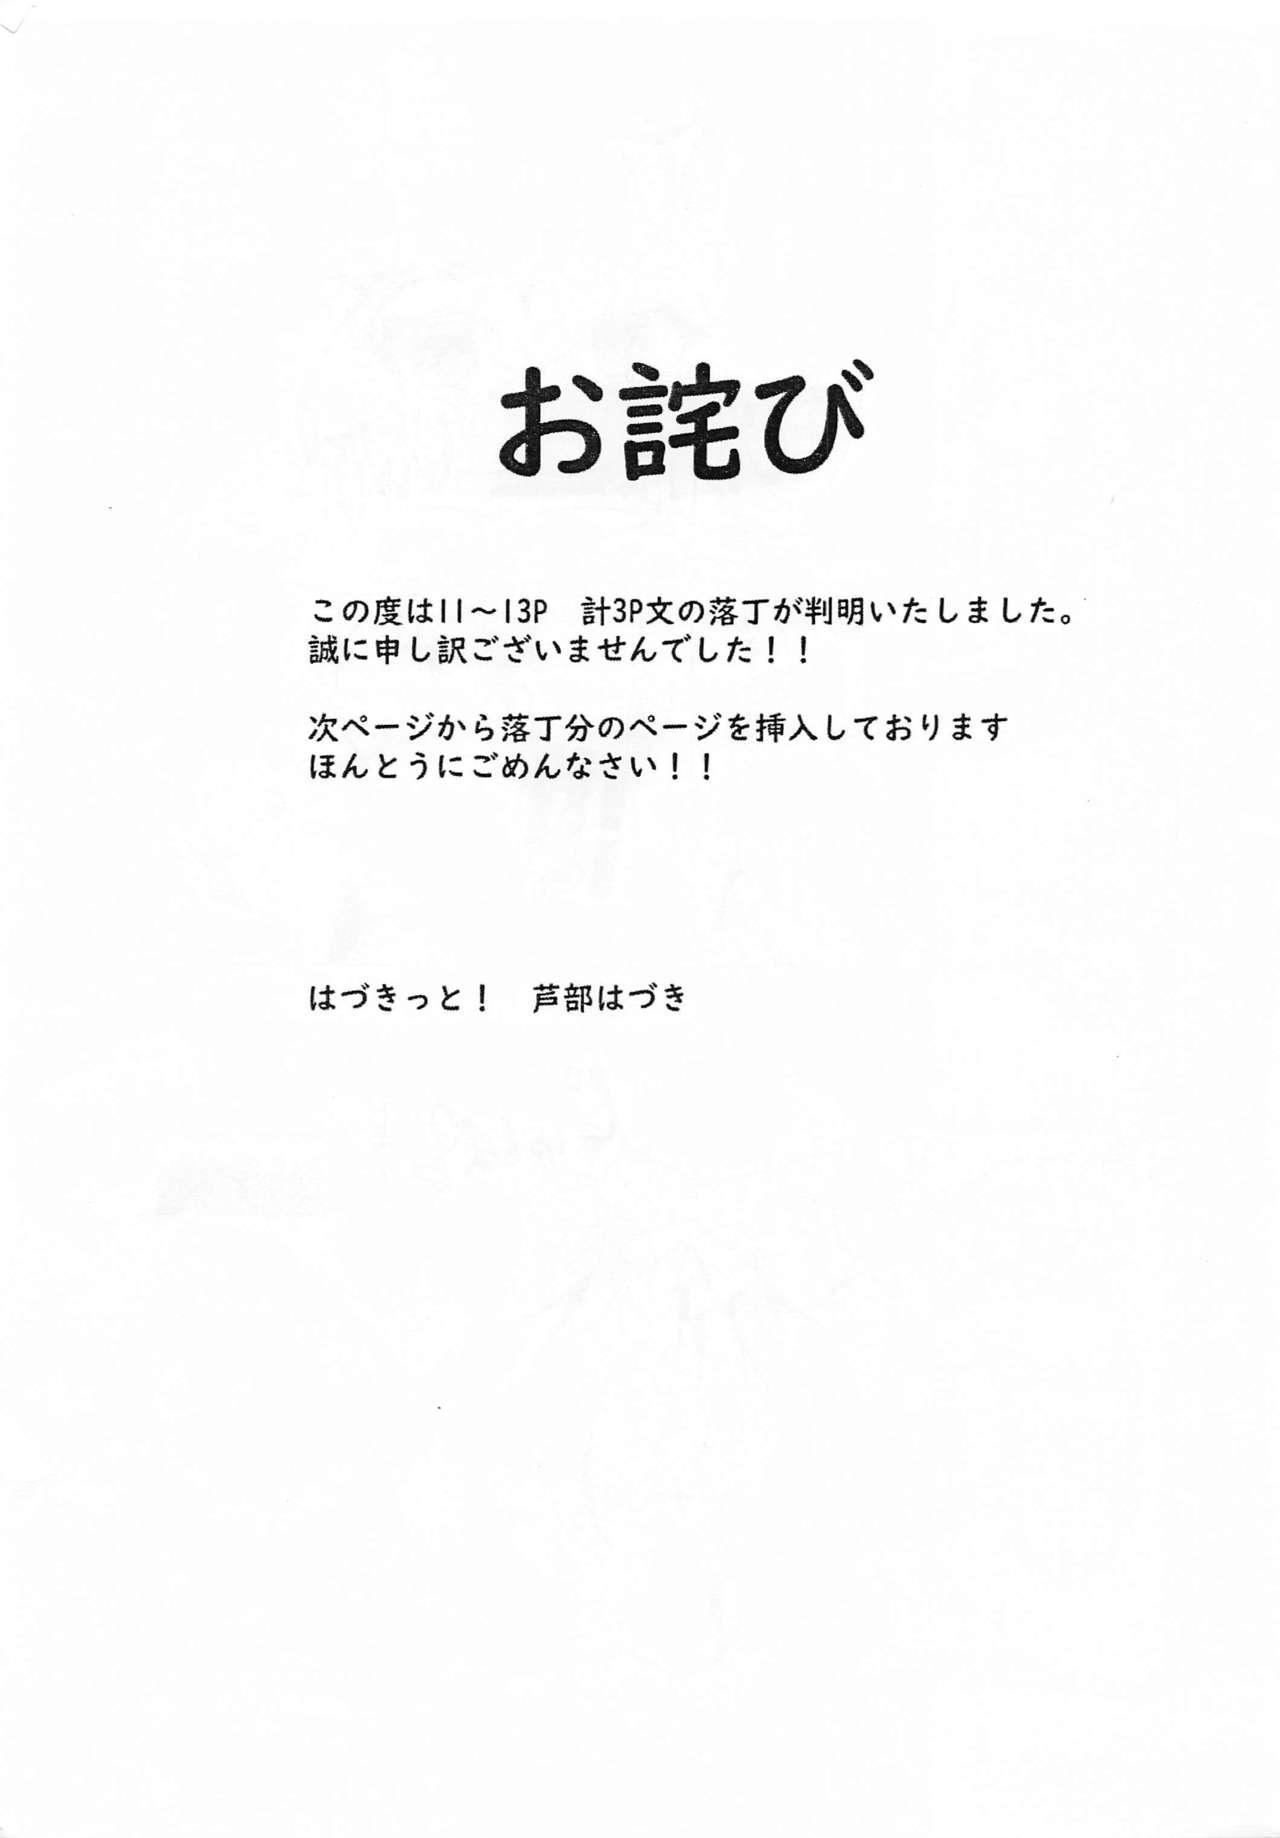 wagamamaerachiowakarasetai! 20